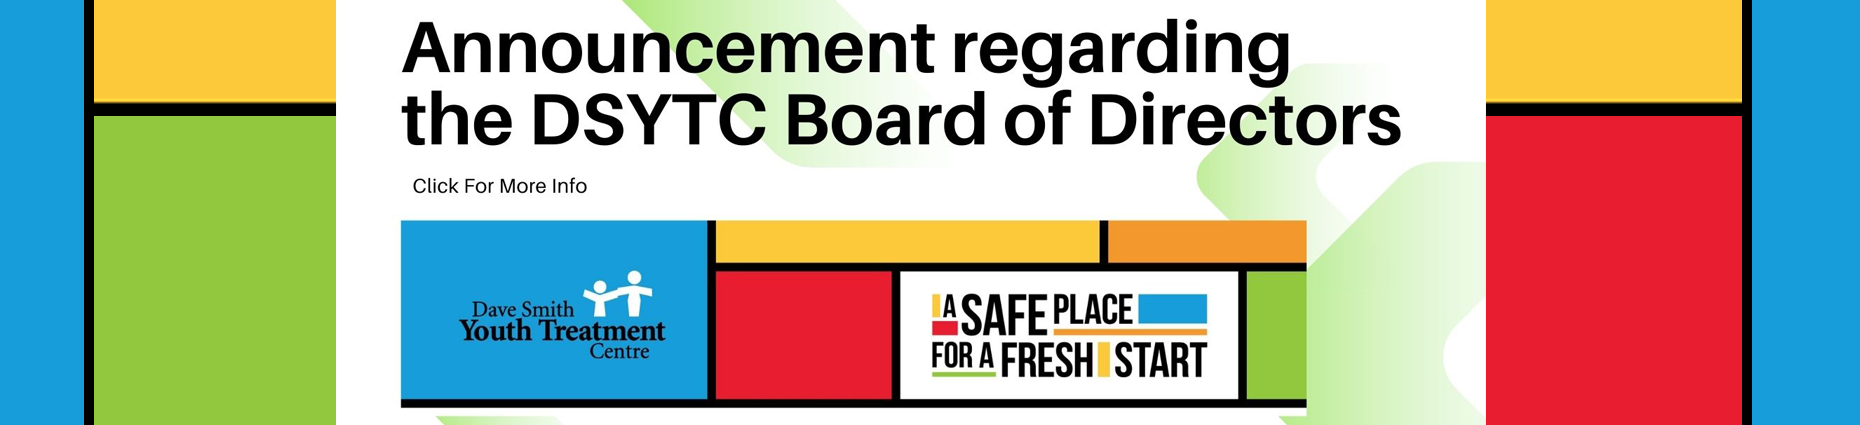 New Board of Directors